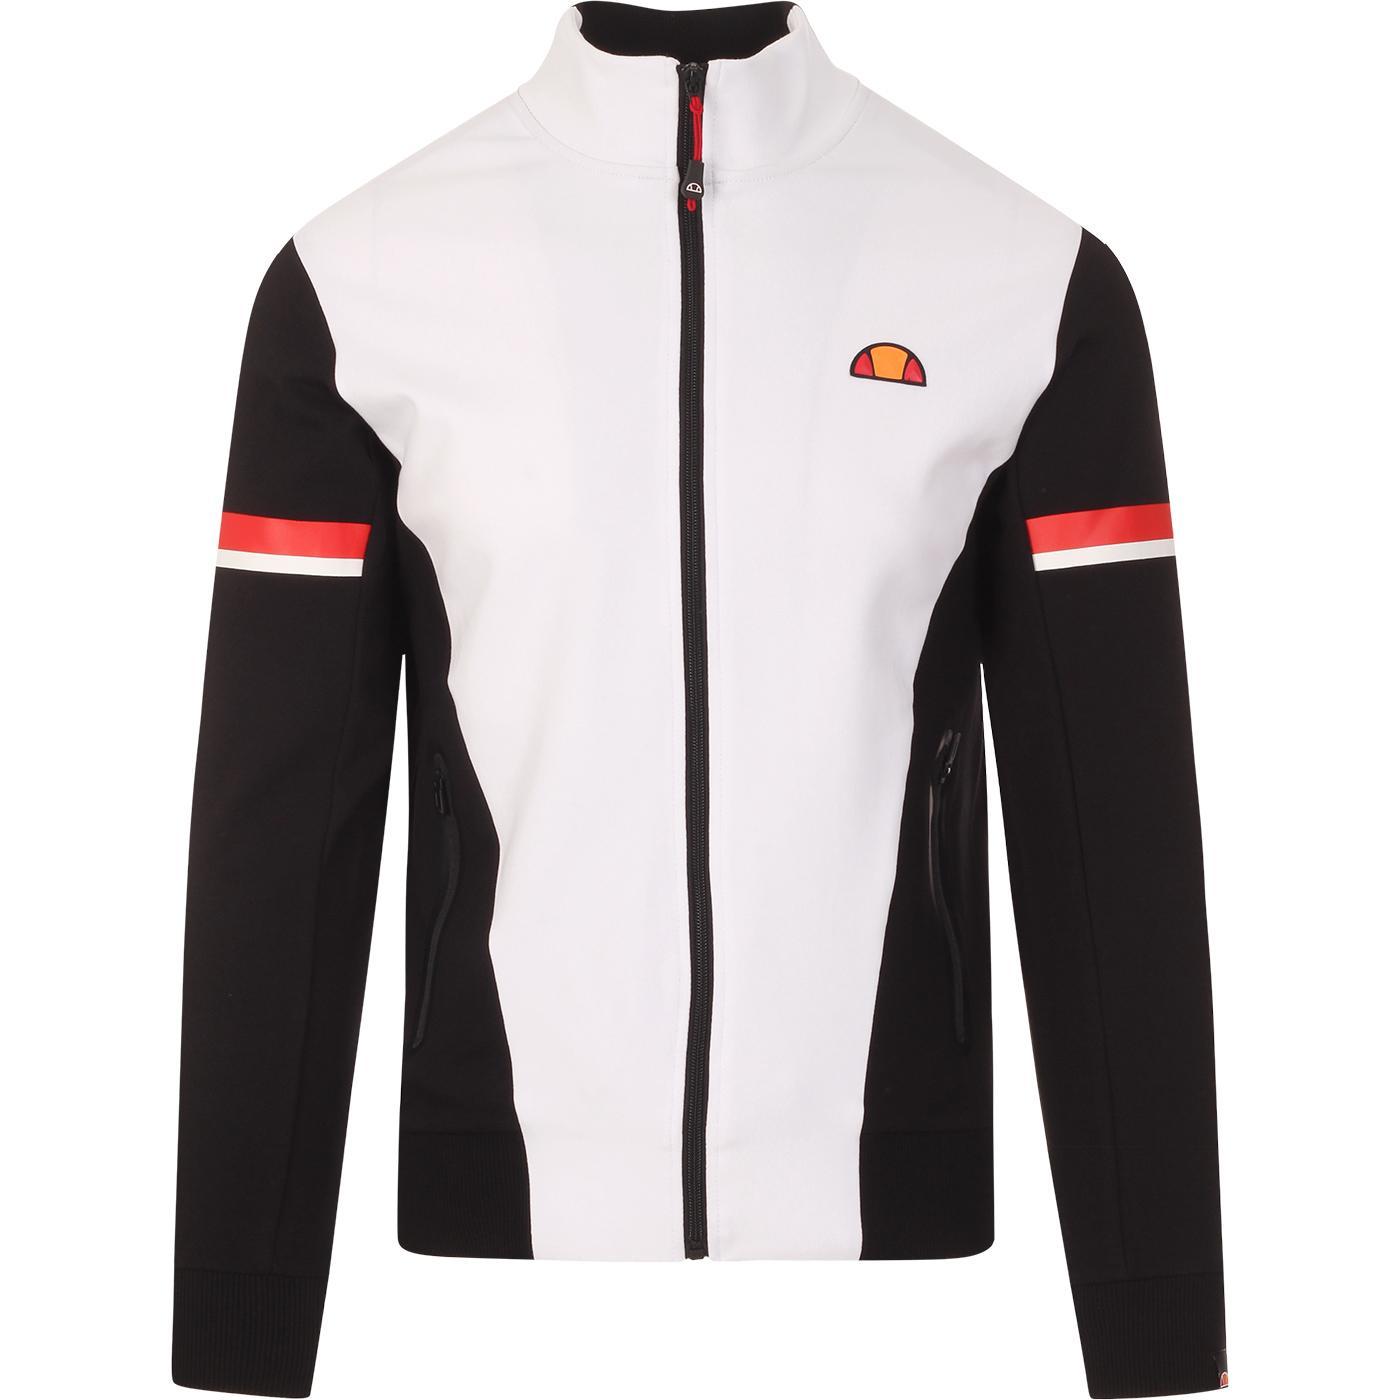 Score ELLESSE Retro 90s Sleeve Stripe Track Jacket